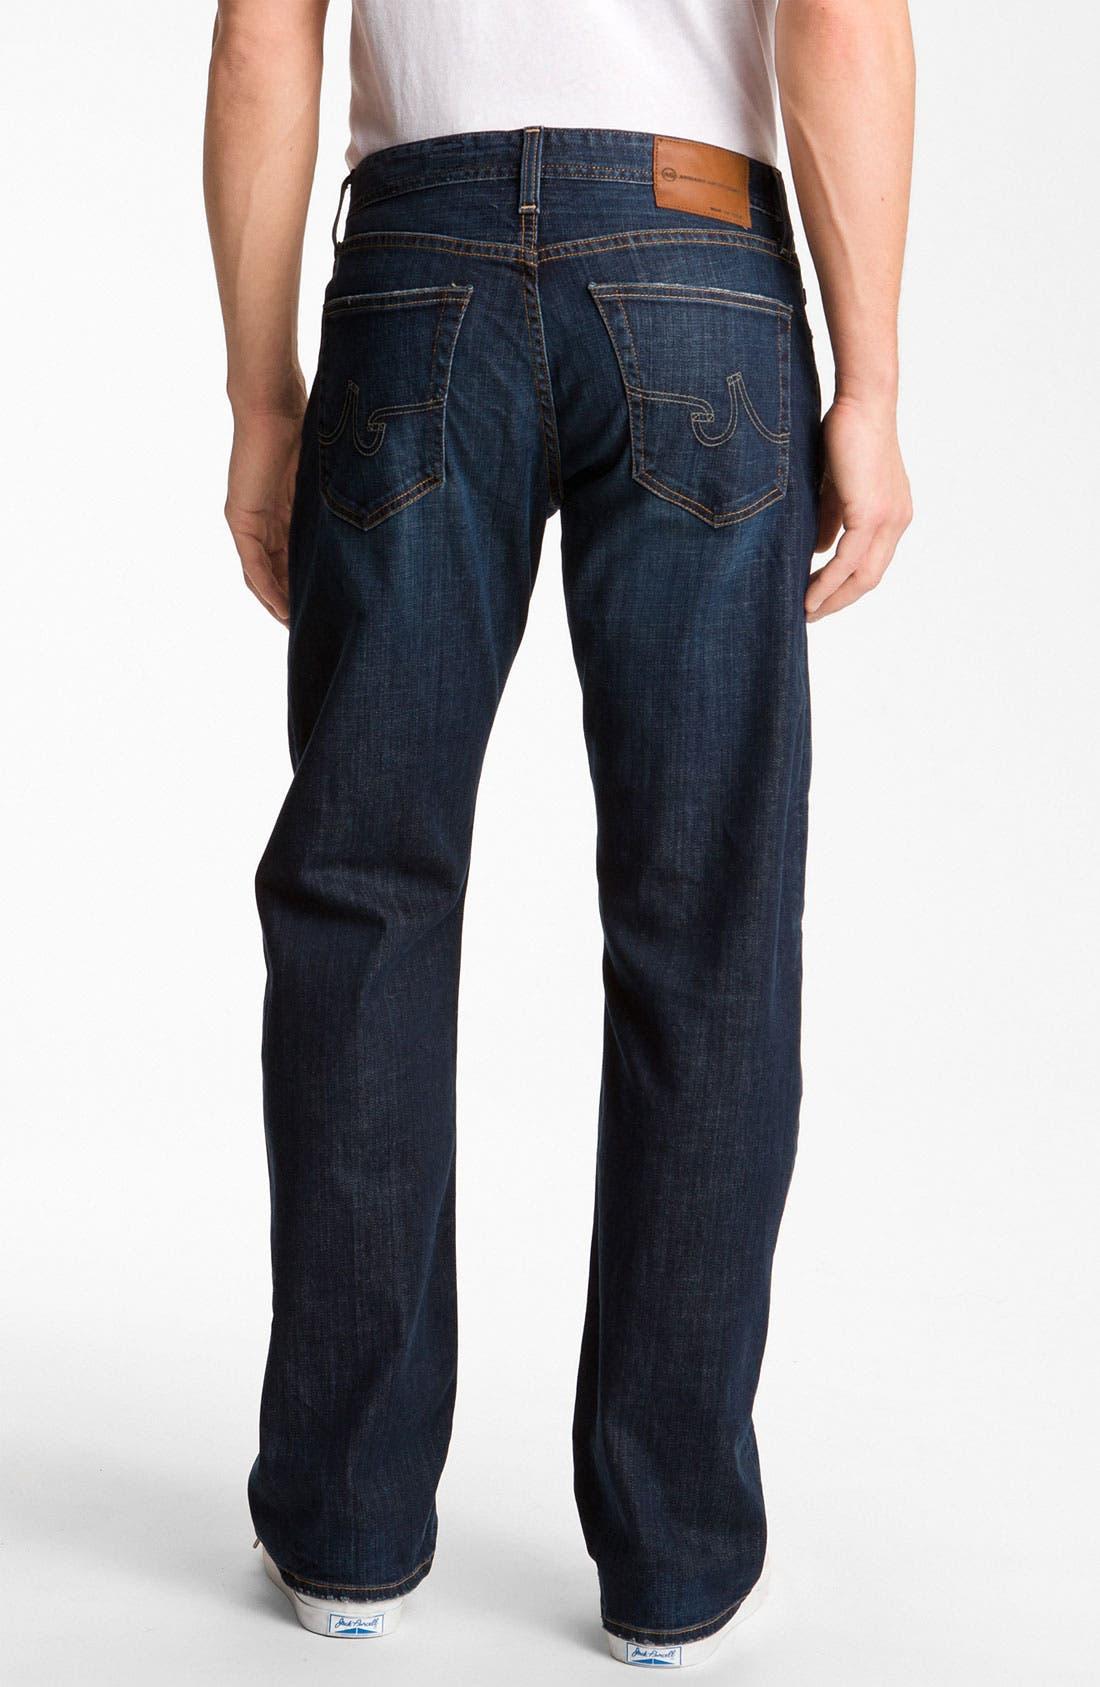 Alternate Image 2  - AG Jeans 'Hero' Relaxed Fit Jeans (Kearney)